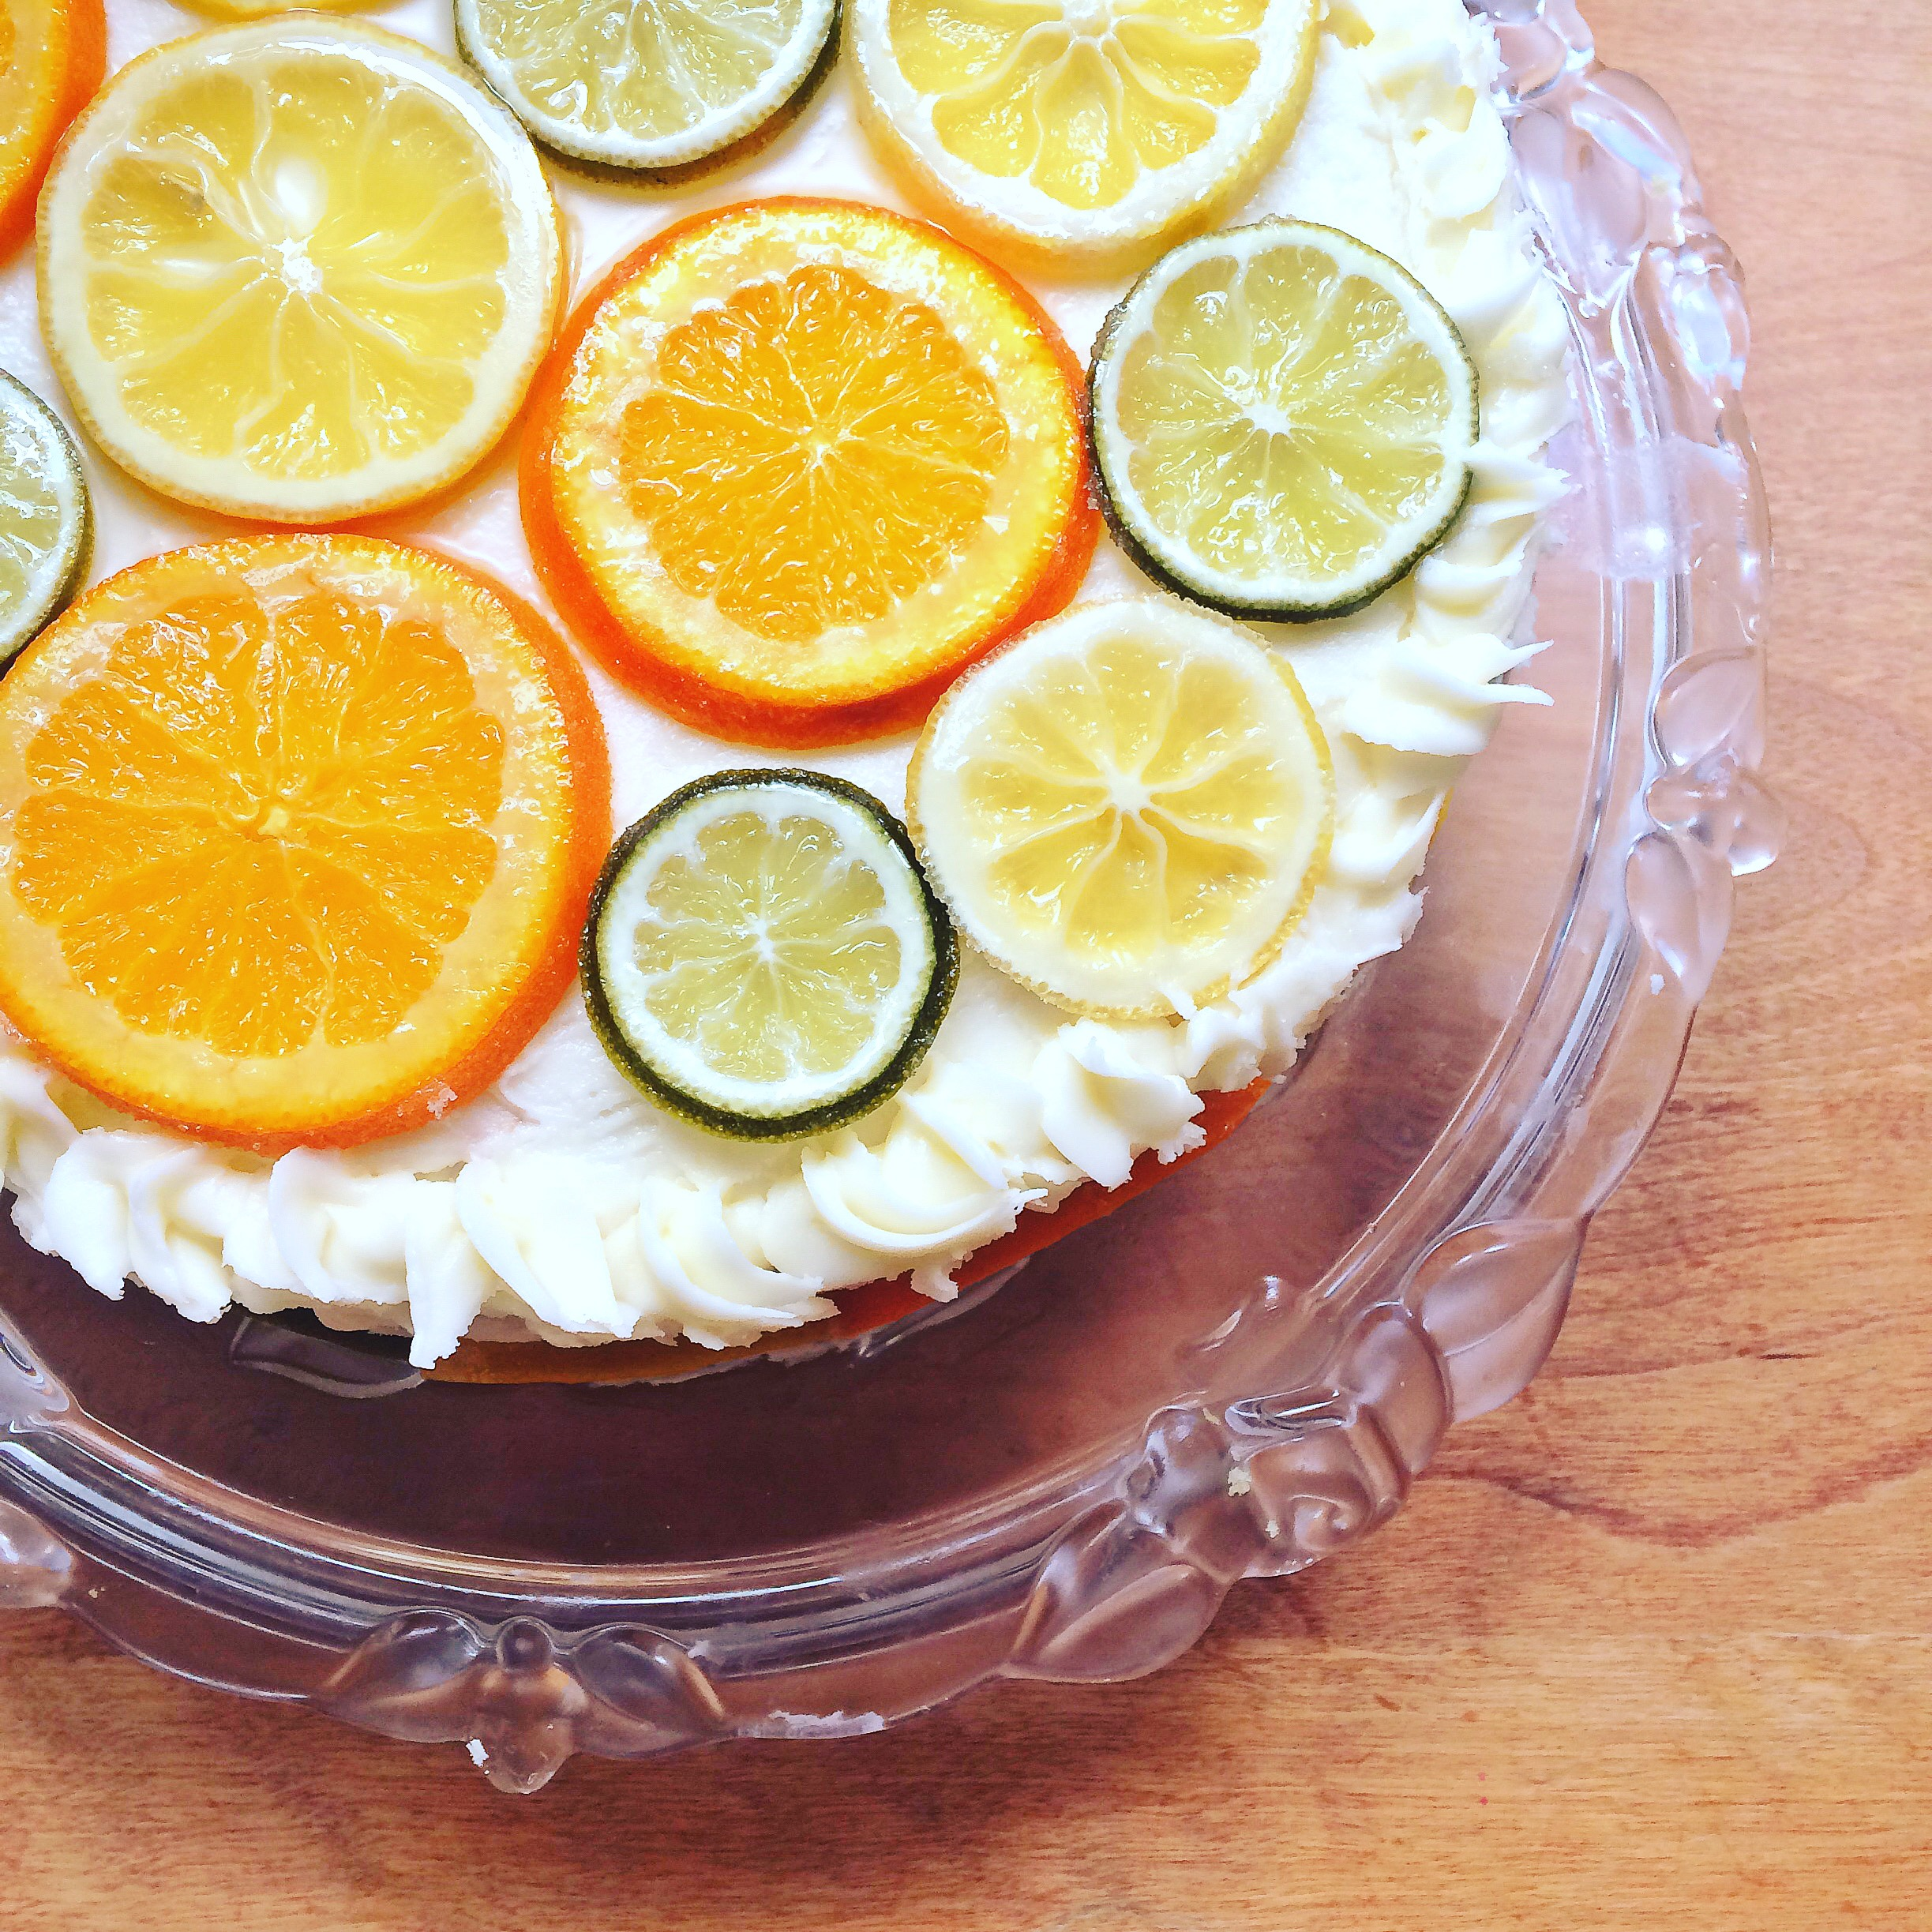 Lemon cake with candied citrus & lemon buttercream